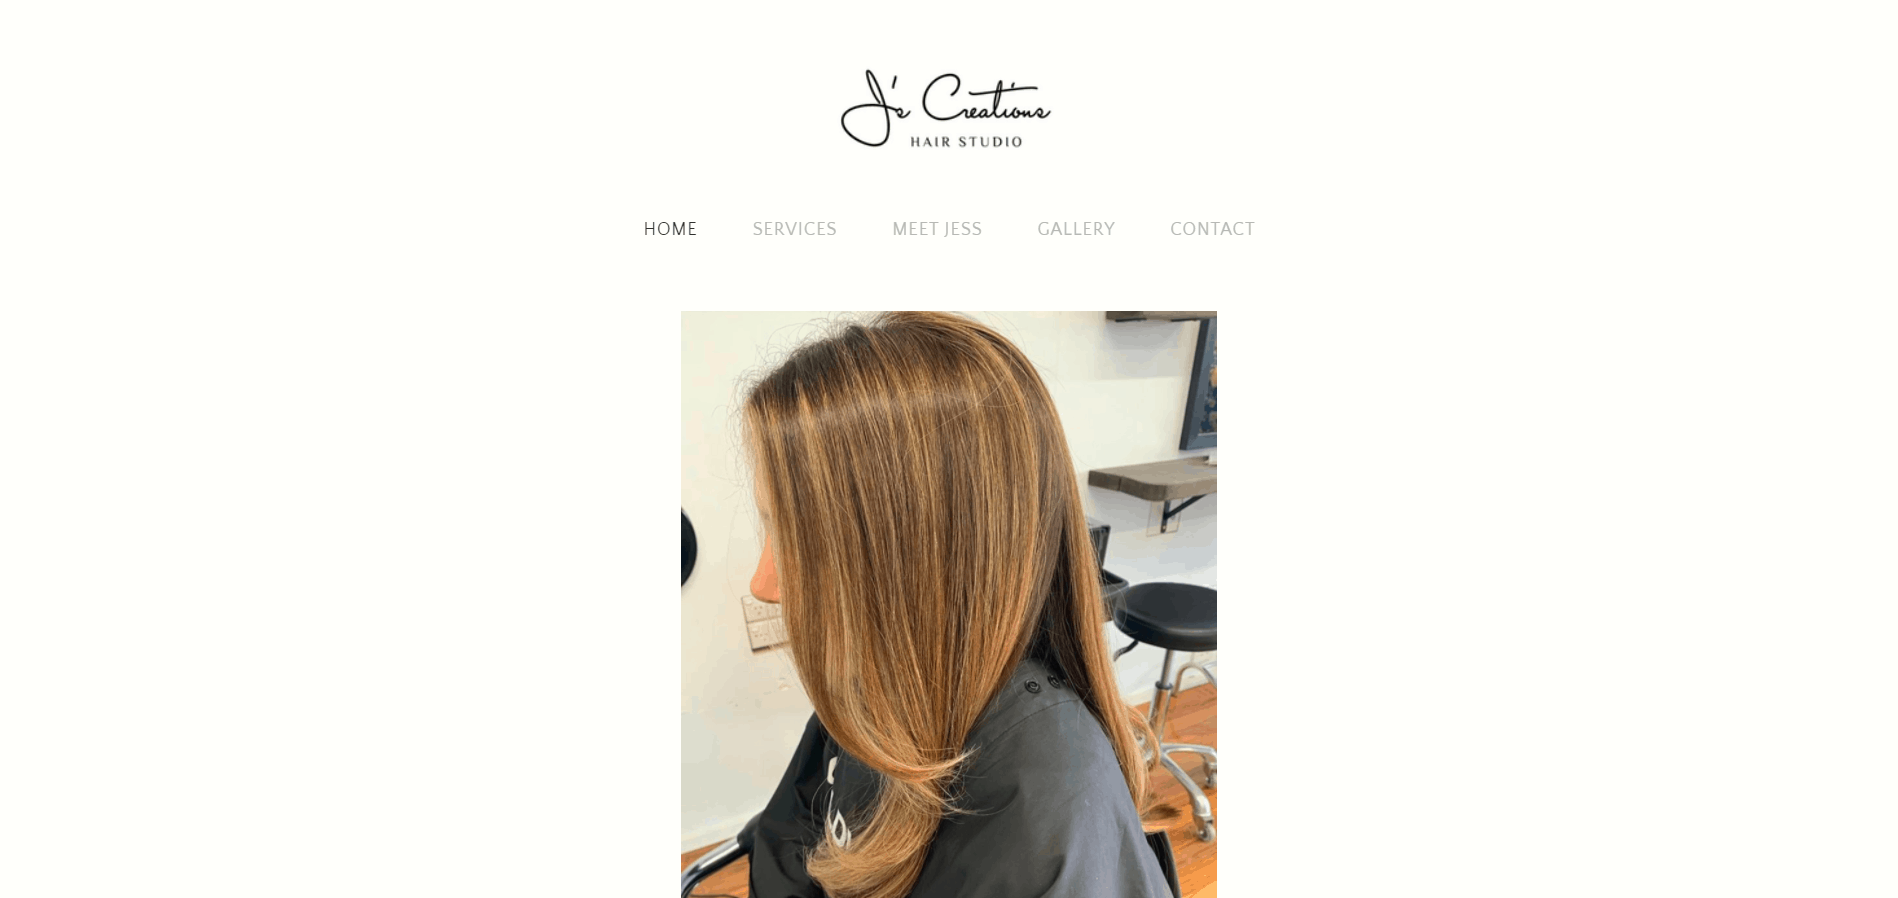 J's Creations Hair Studio